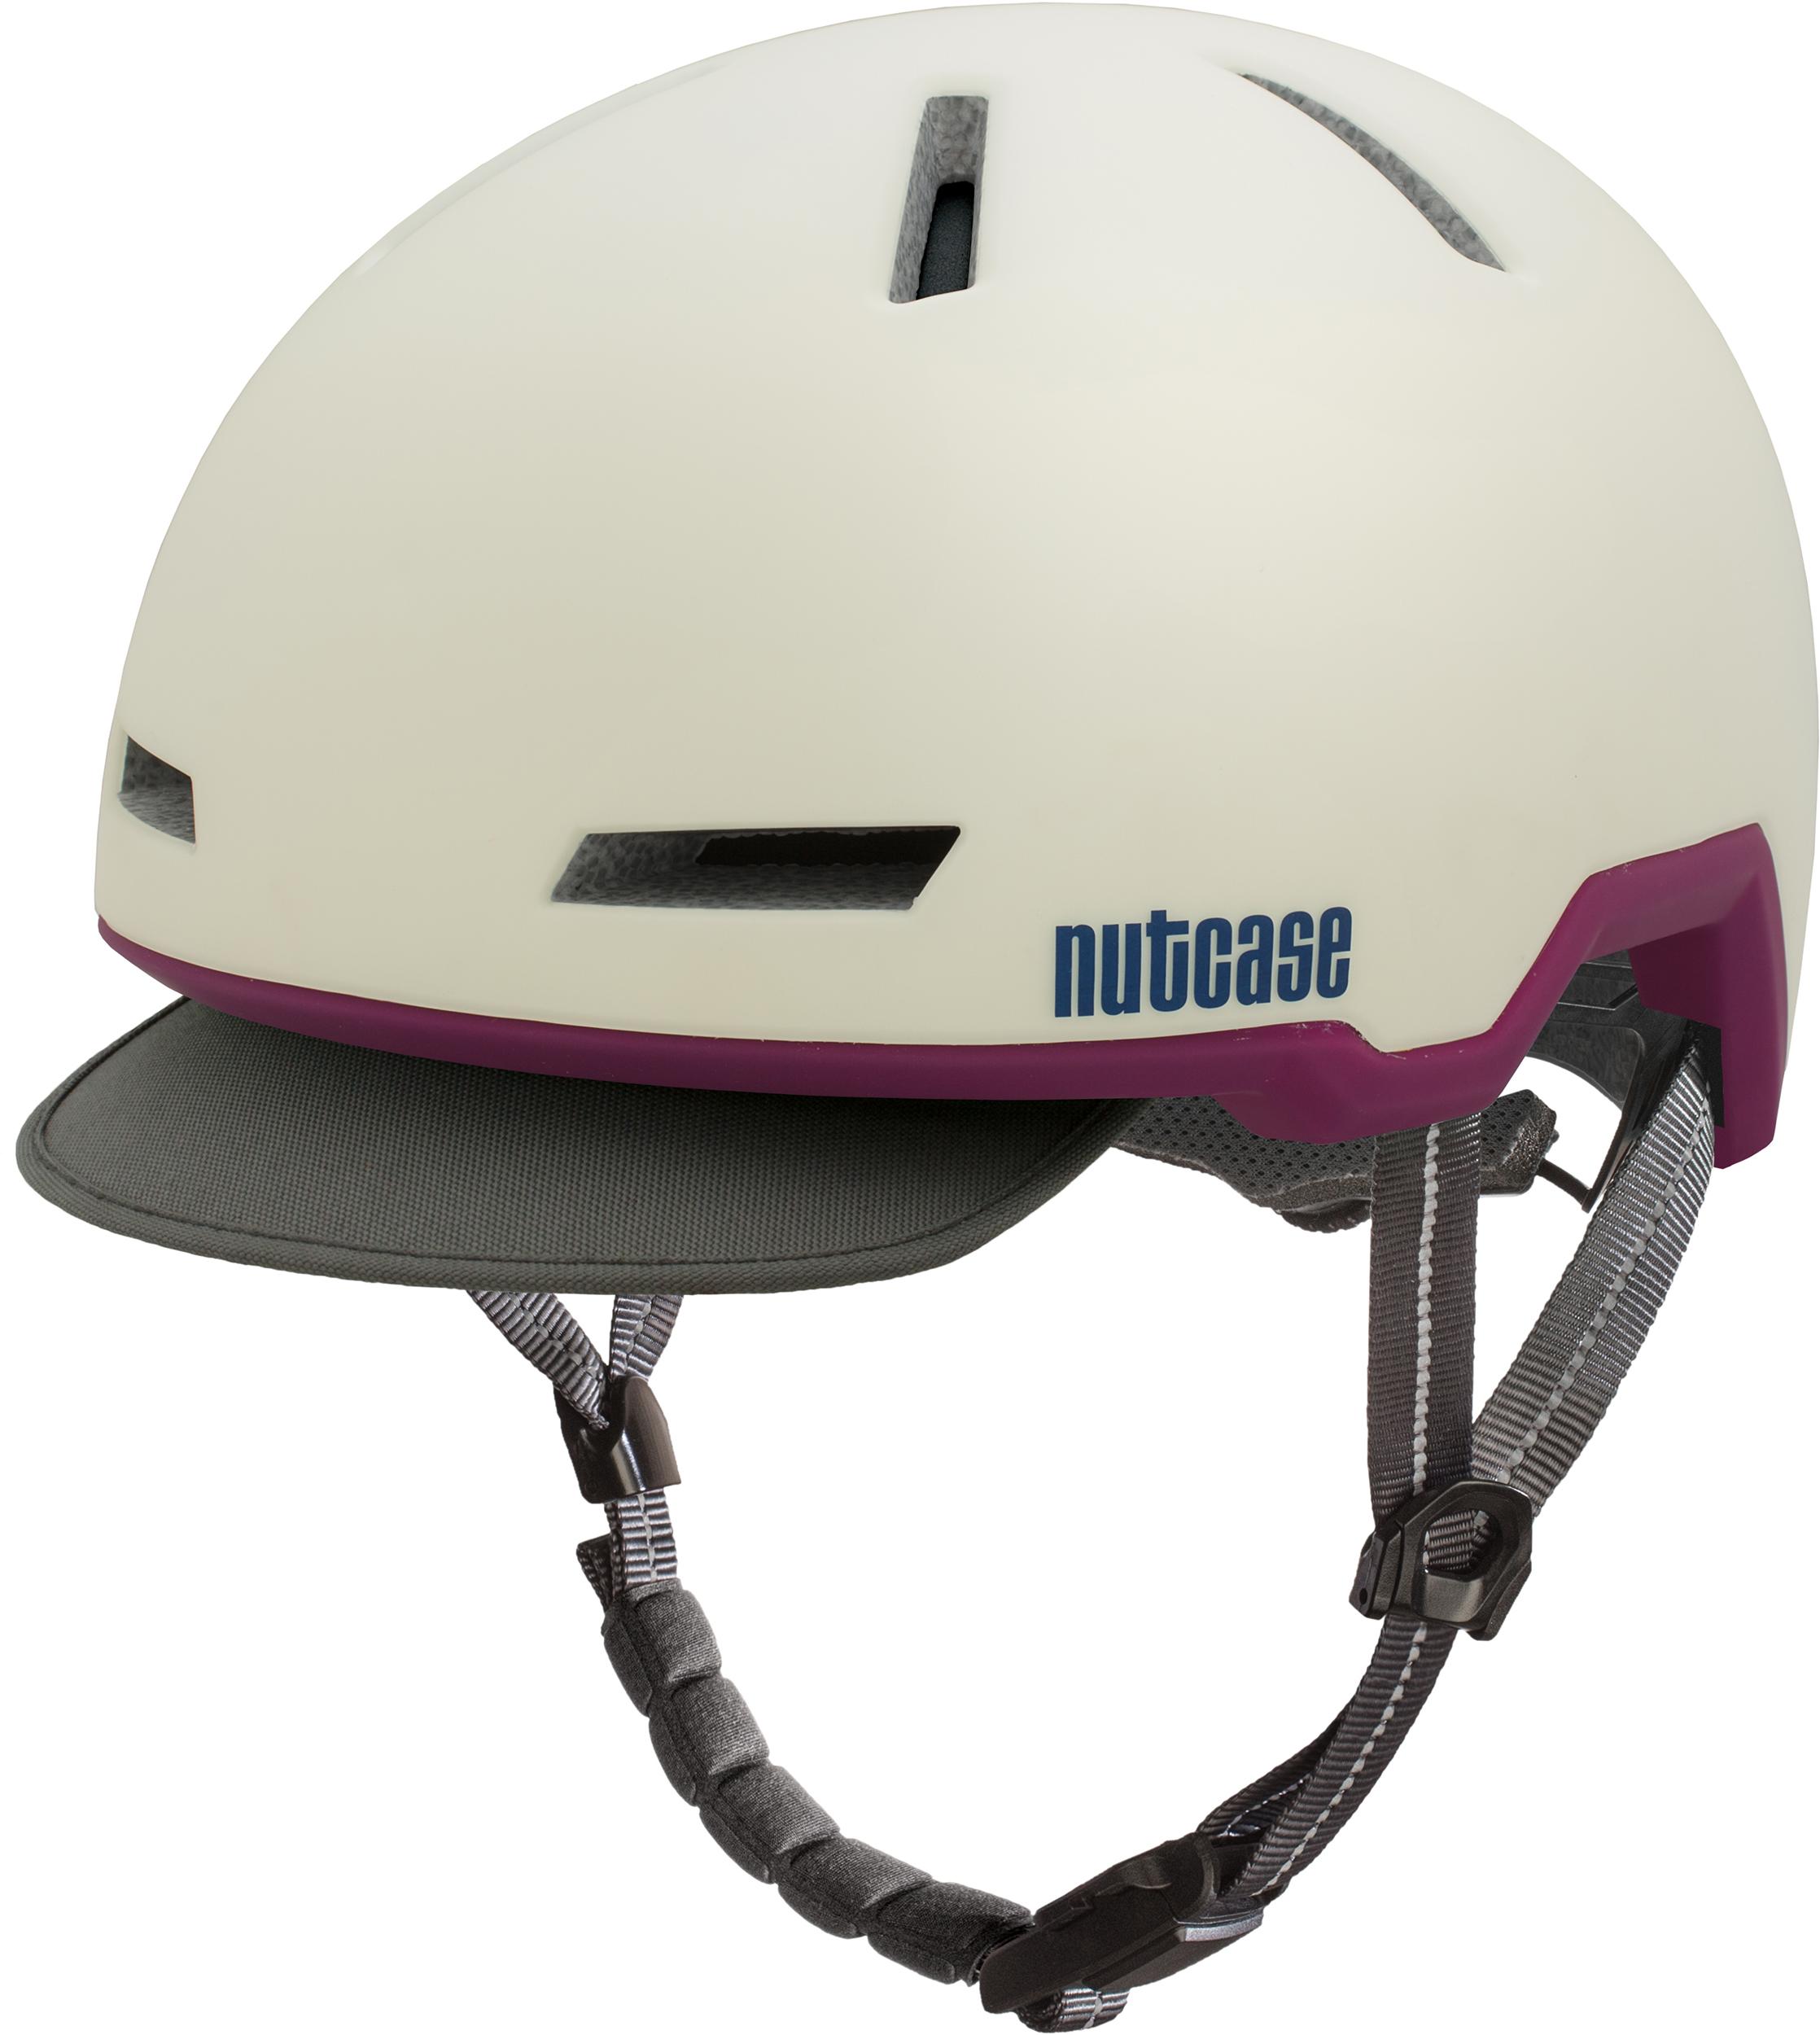 7565f67be6 Nutcase Tracer Helmet - Unisex